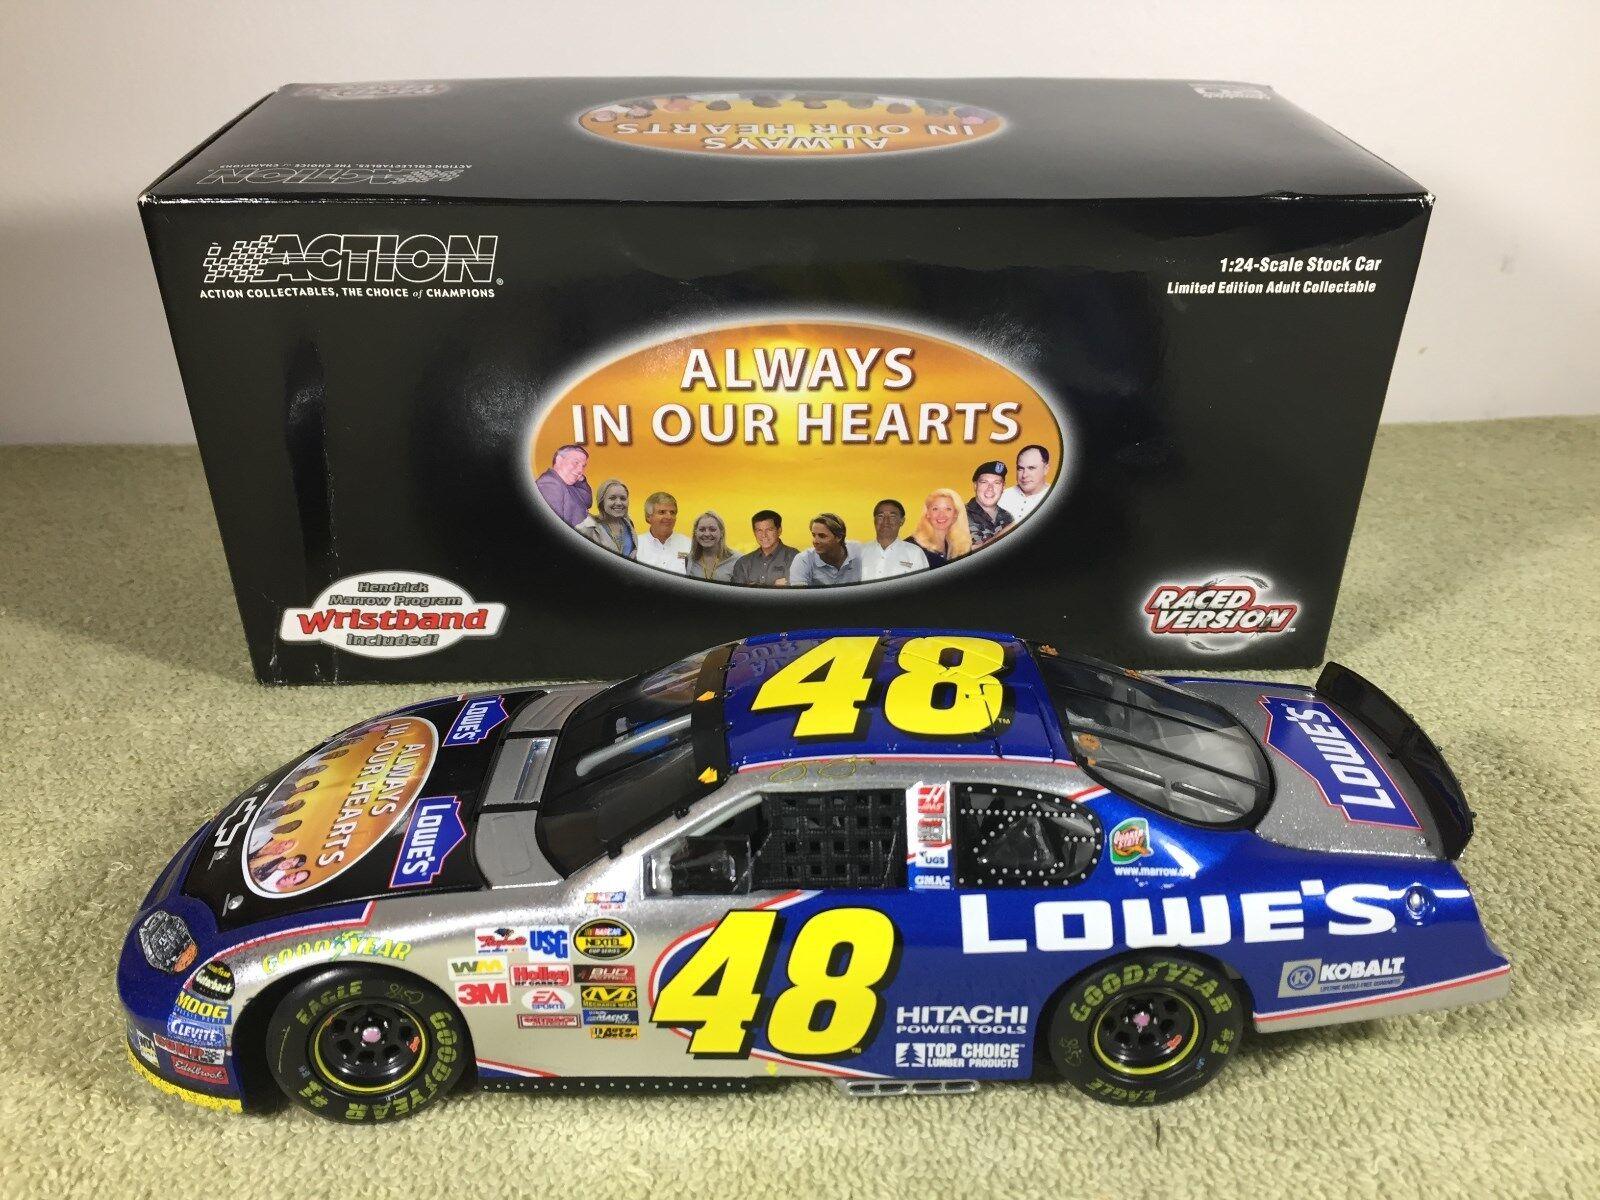 2004 Action JIMMIE JOHNSON Lowes Atlanta Race Version Diecast Nascar 1 24